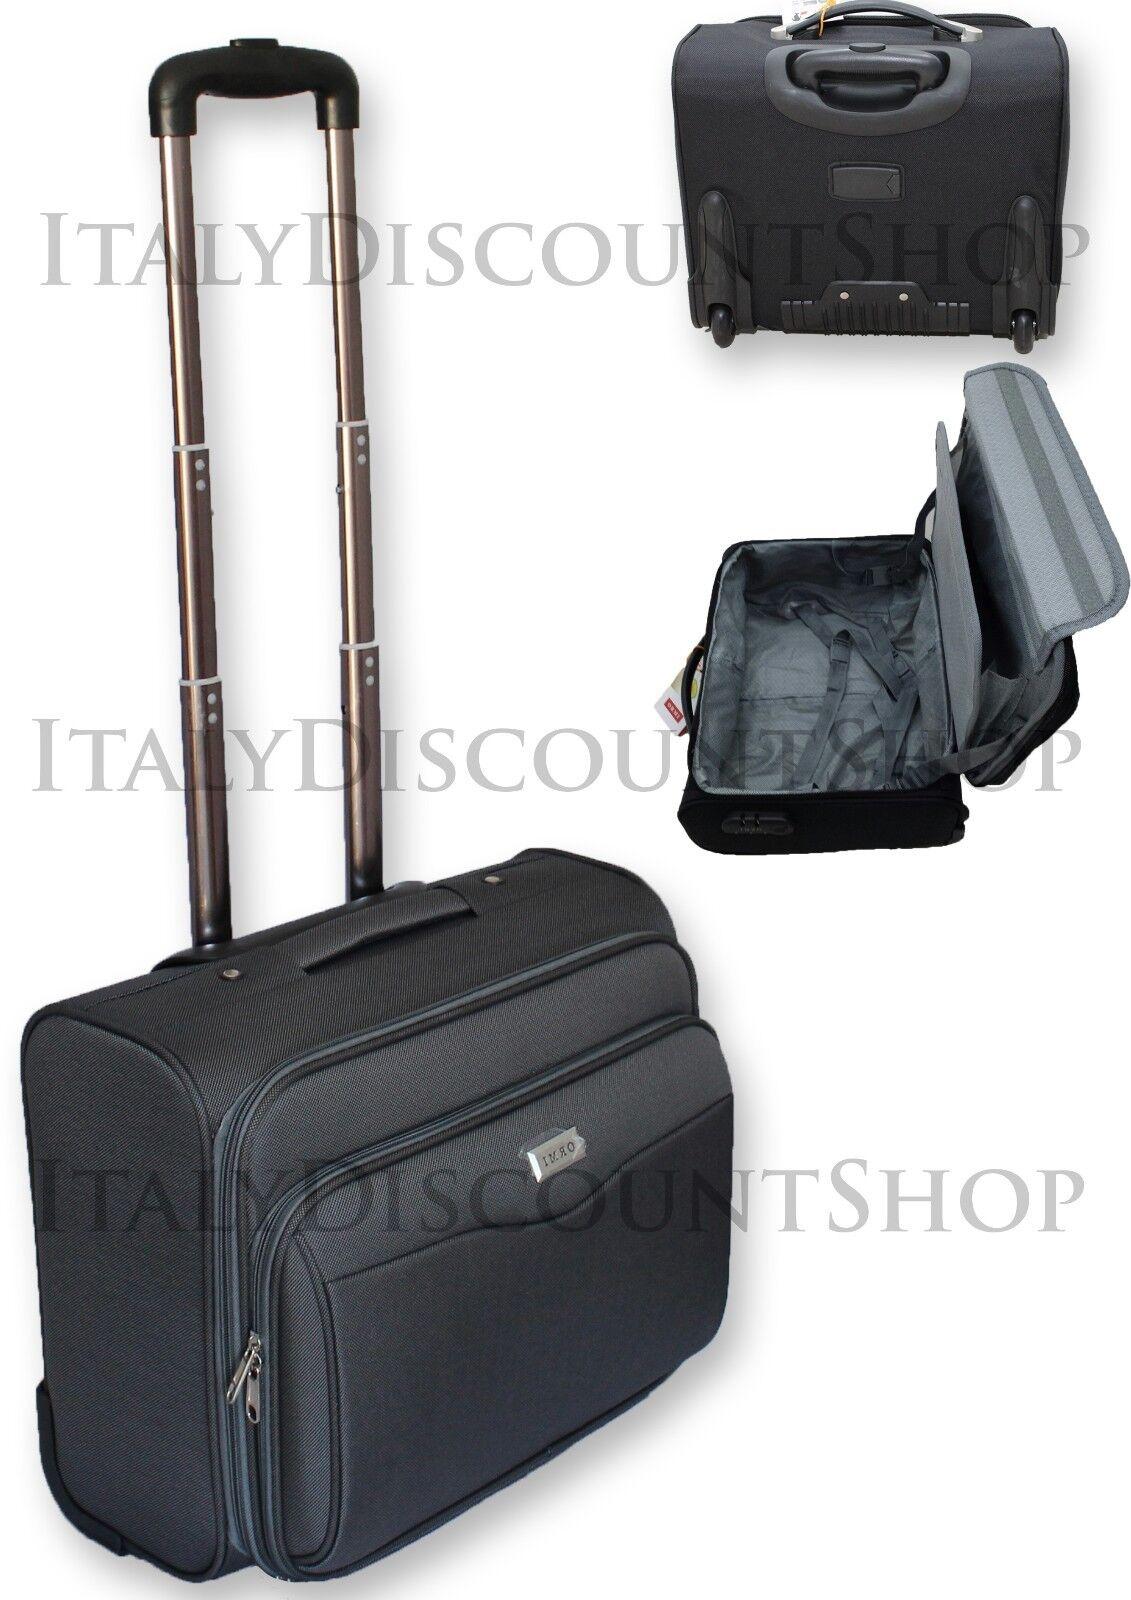 VALIGIA TROLLEY BAGAGLIO A MANO PILOTA BUSINESS TASCA PC